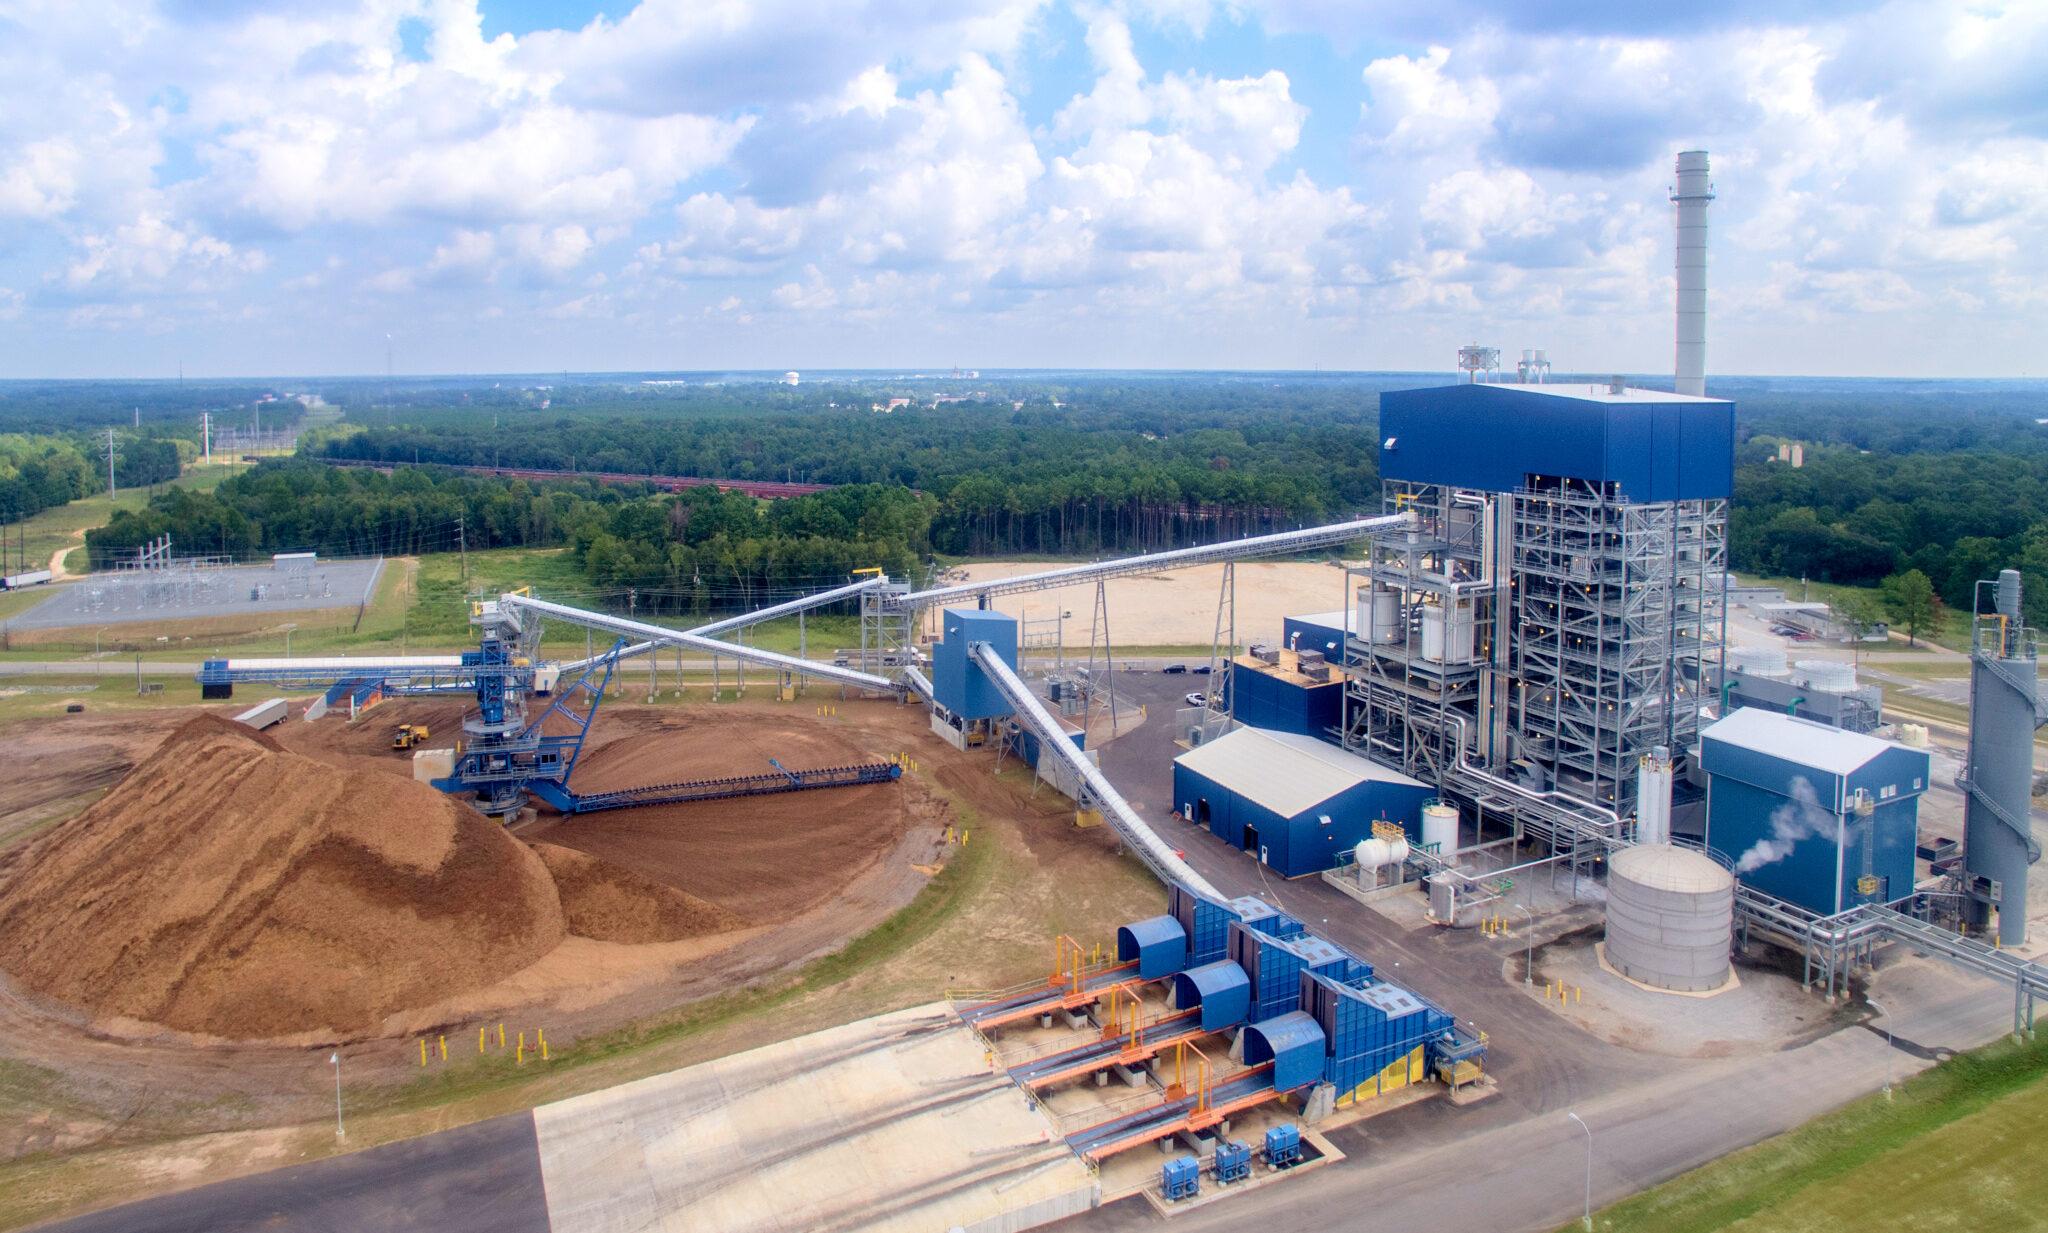 Albany Green Energy – Aerial